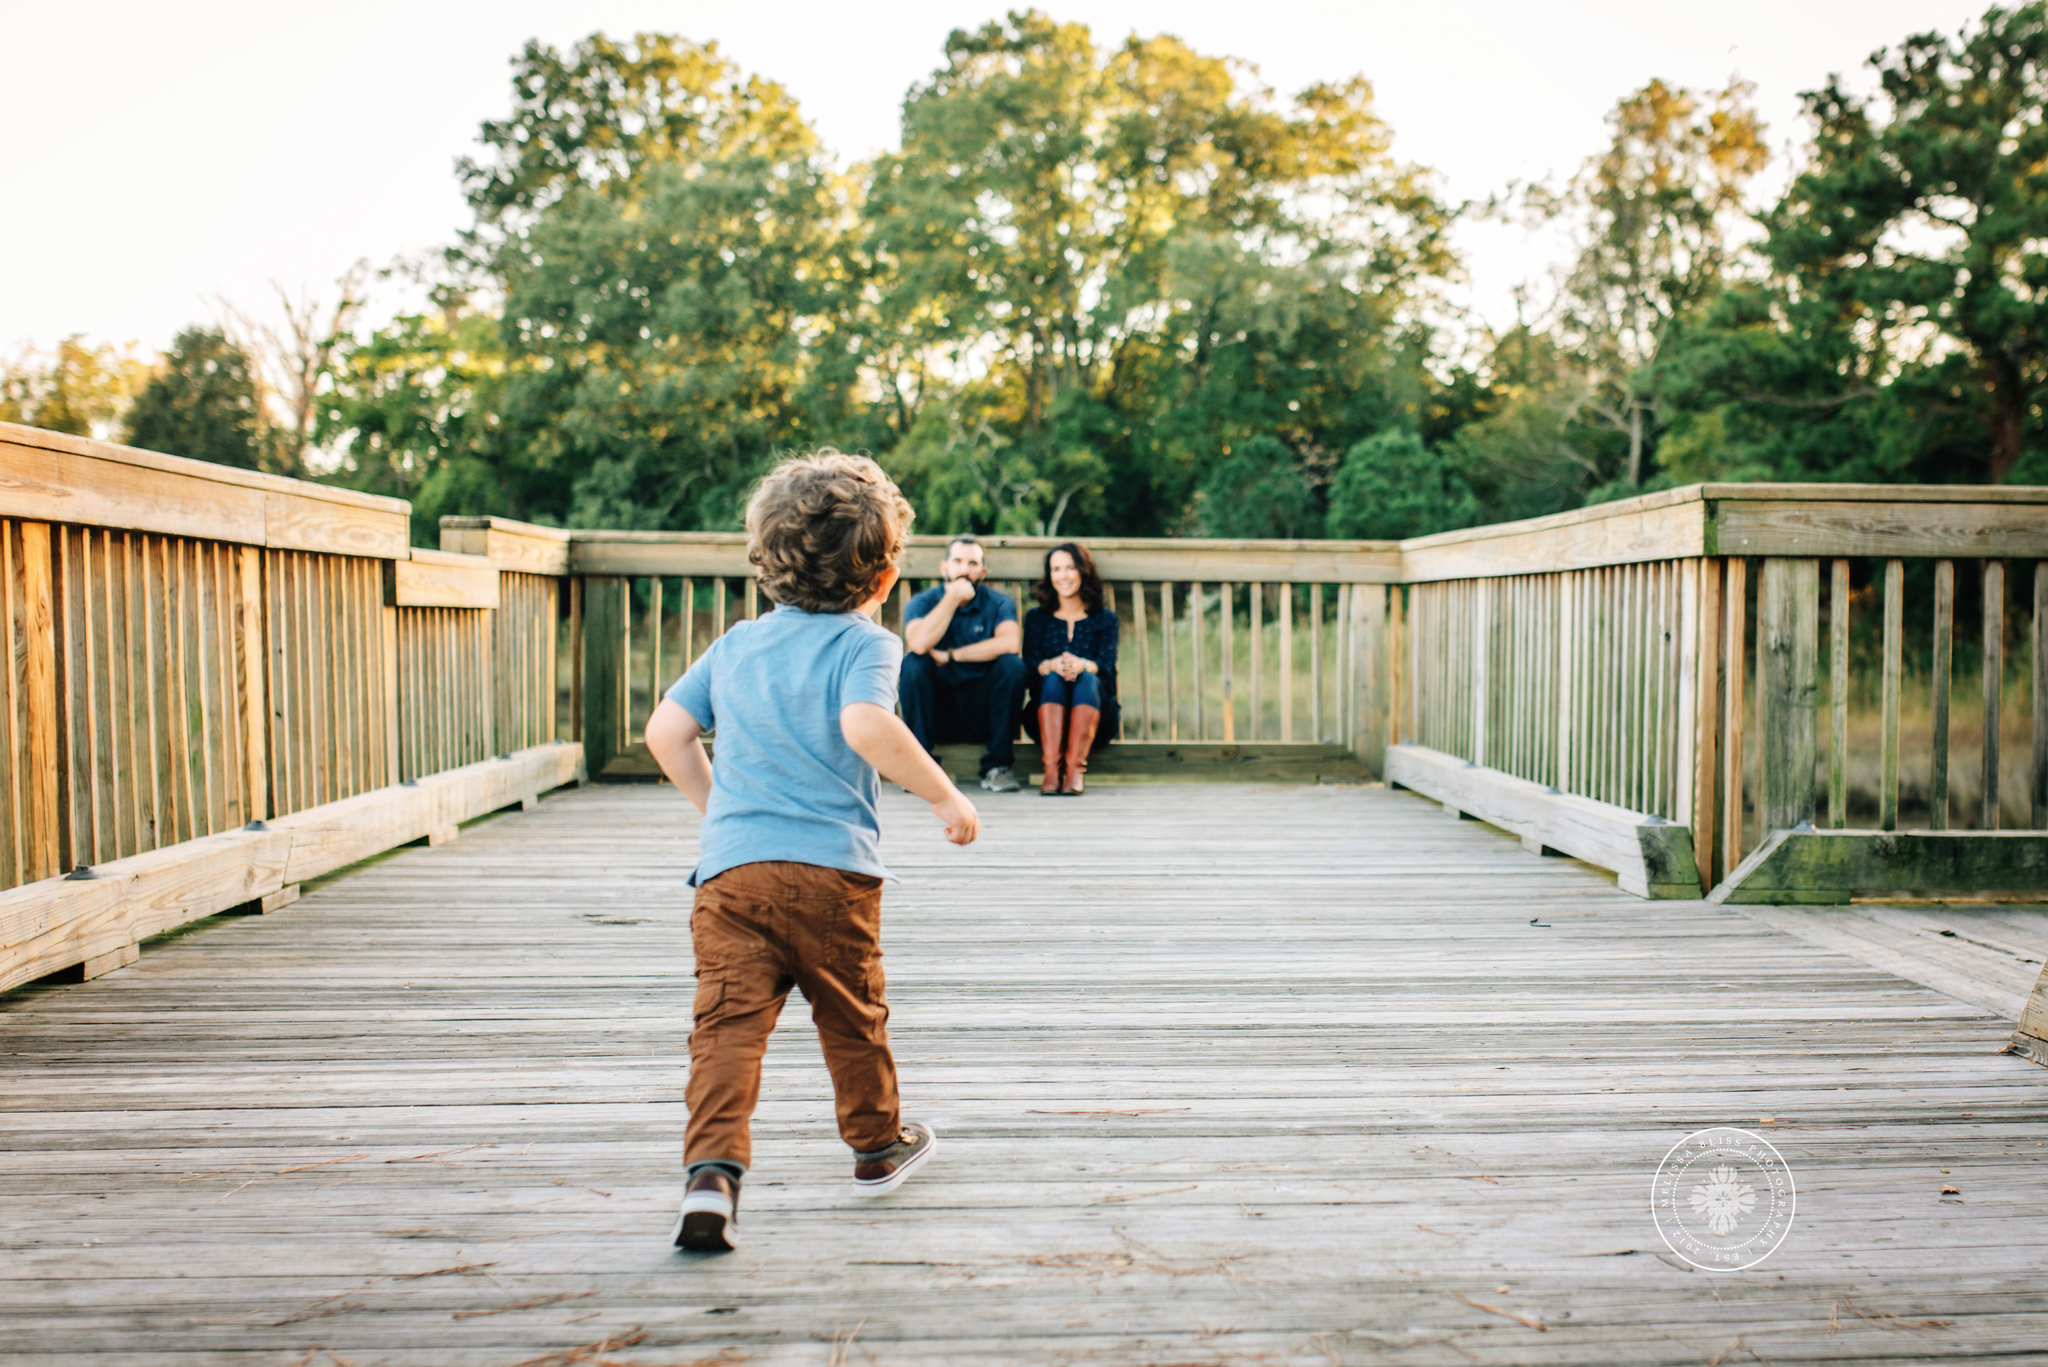 norfolk-family-lifestyle-photographer-virginia-beach-family-photographer-chesapeake-lifestyle-photography-melissa-bliss-photography-fall-family-session